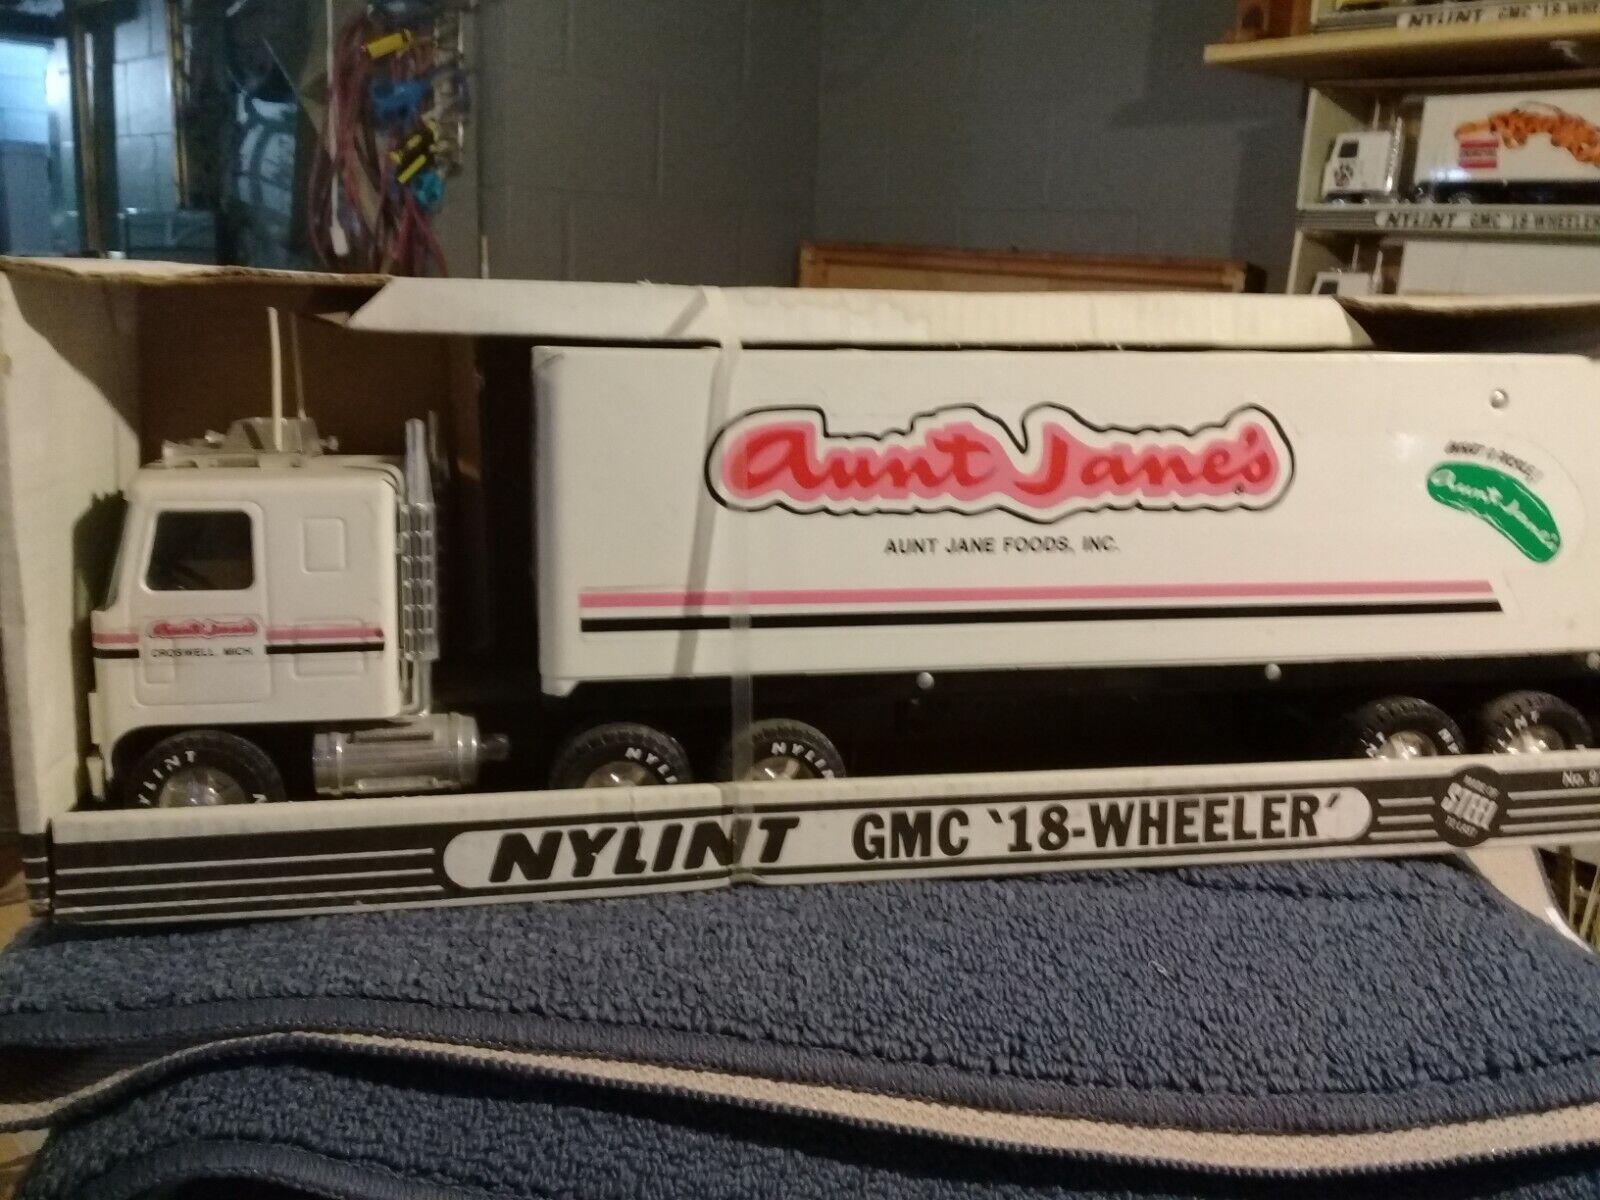 Vintage nylint semi tractor trailer pressed steel aunt jane's food